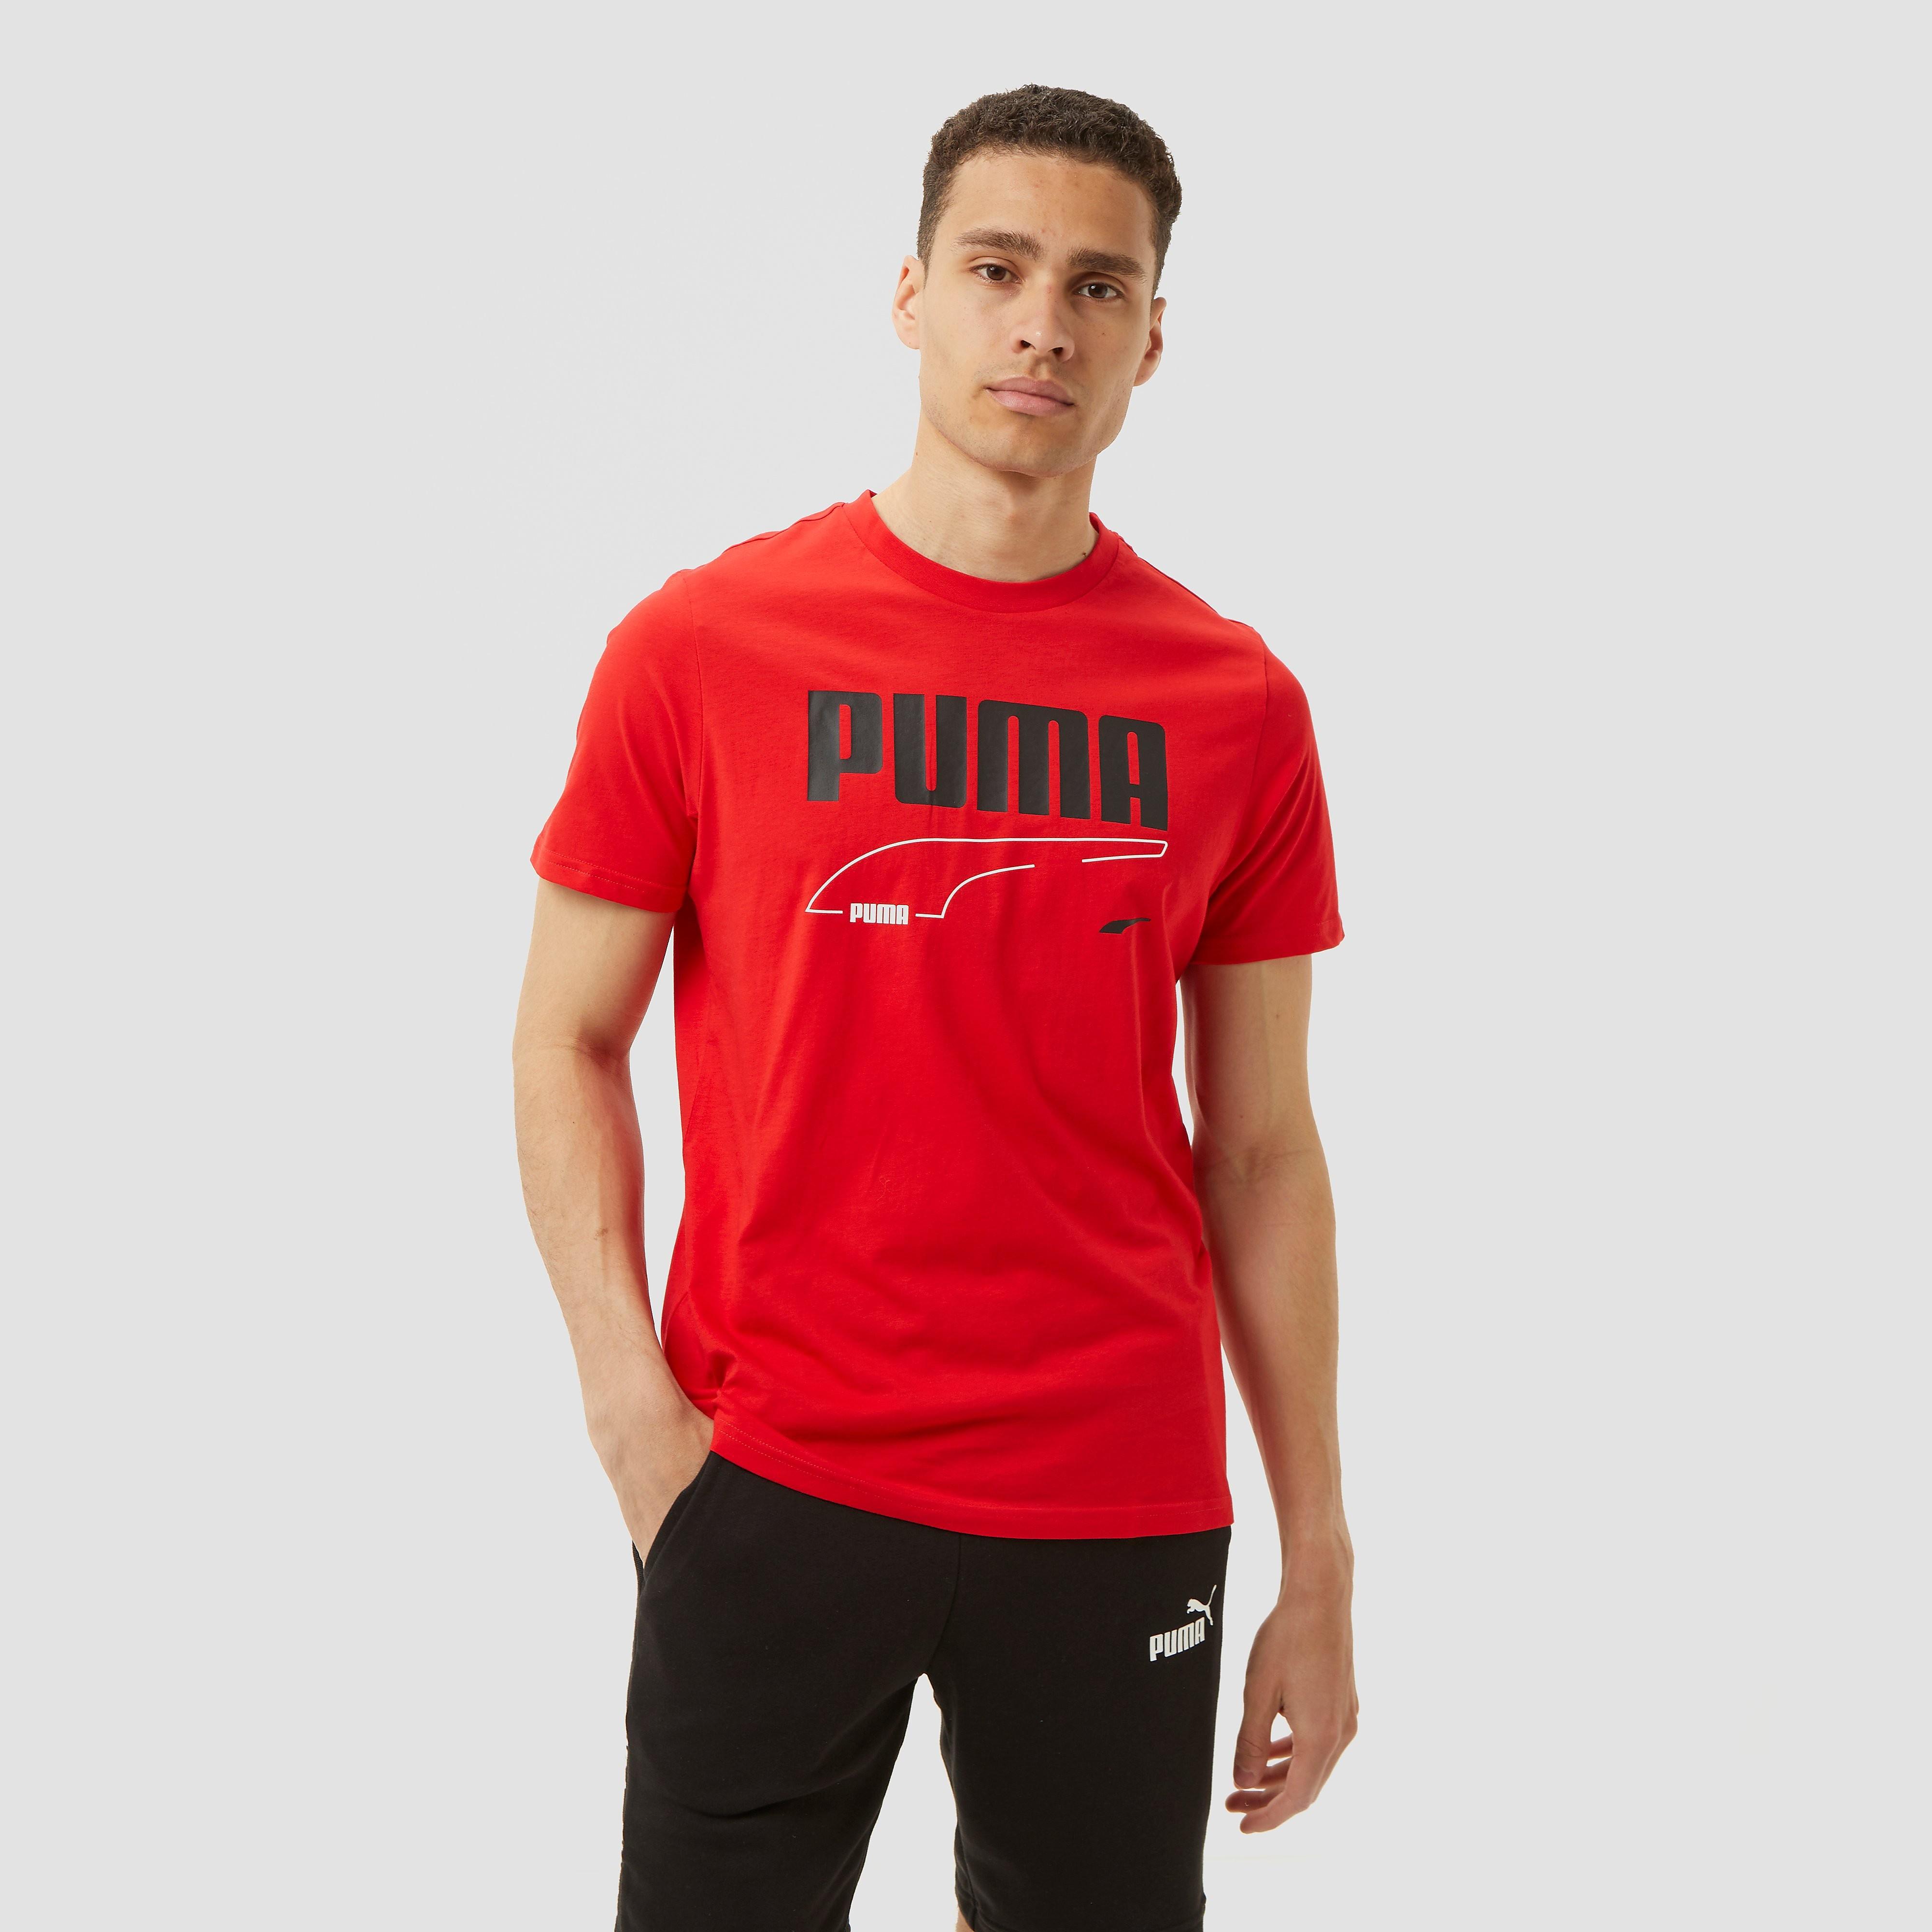 Puma Puma rebel tee heren